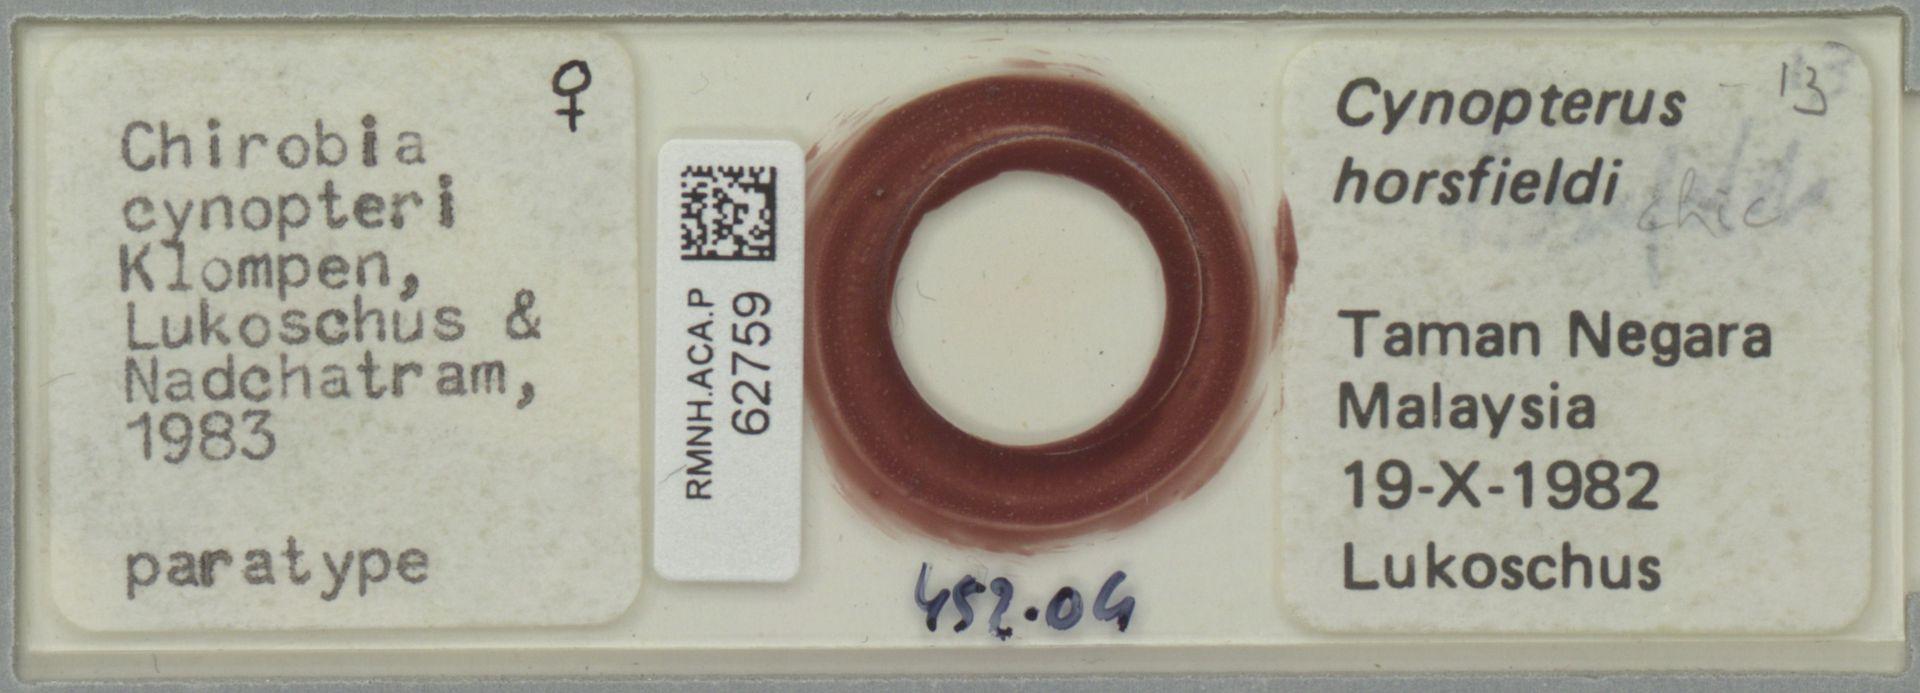 RMNH.ACA.P.62759 | Chirobia cynopteri Klompen, Lukoschus & Nadchatram, 1983